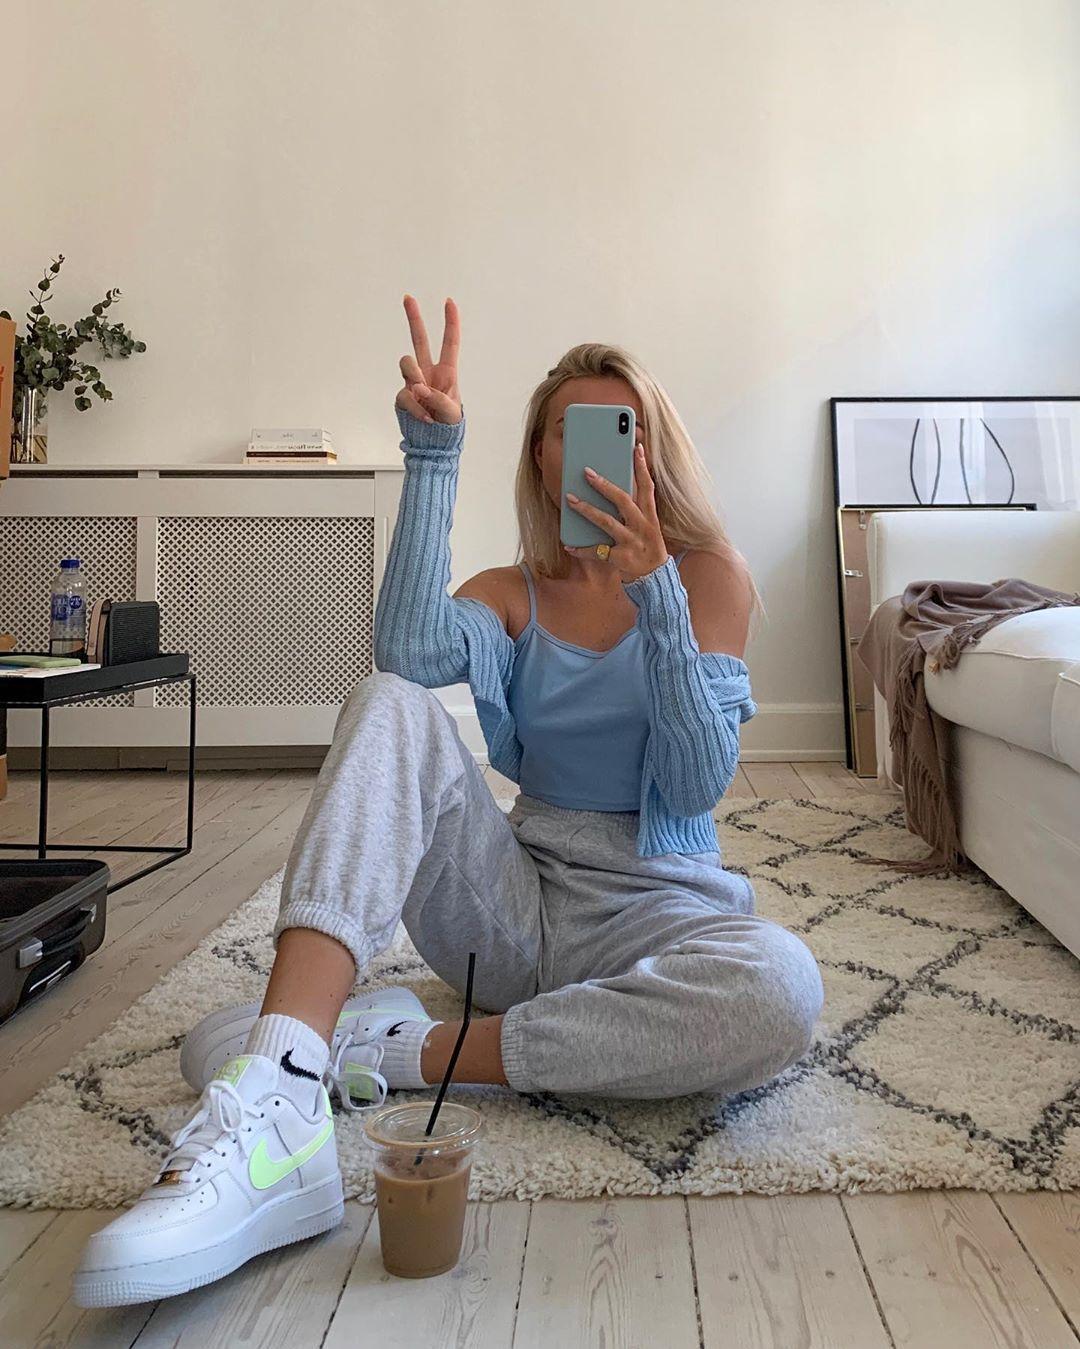 "Amanda Marie Nielsen 🍒 on Instagram: ""Kickin' off iced Coffee season"", #Amanda #Coffee #iced #Instagram #Kickin #Marie #Nielsen #Season"